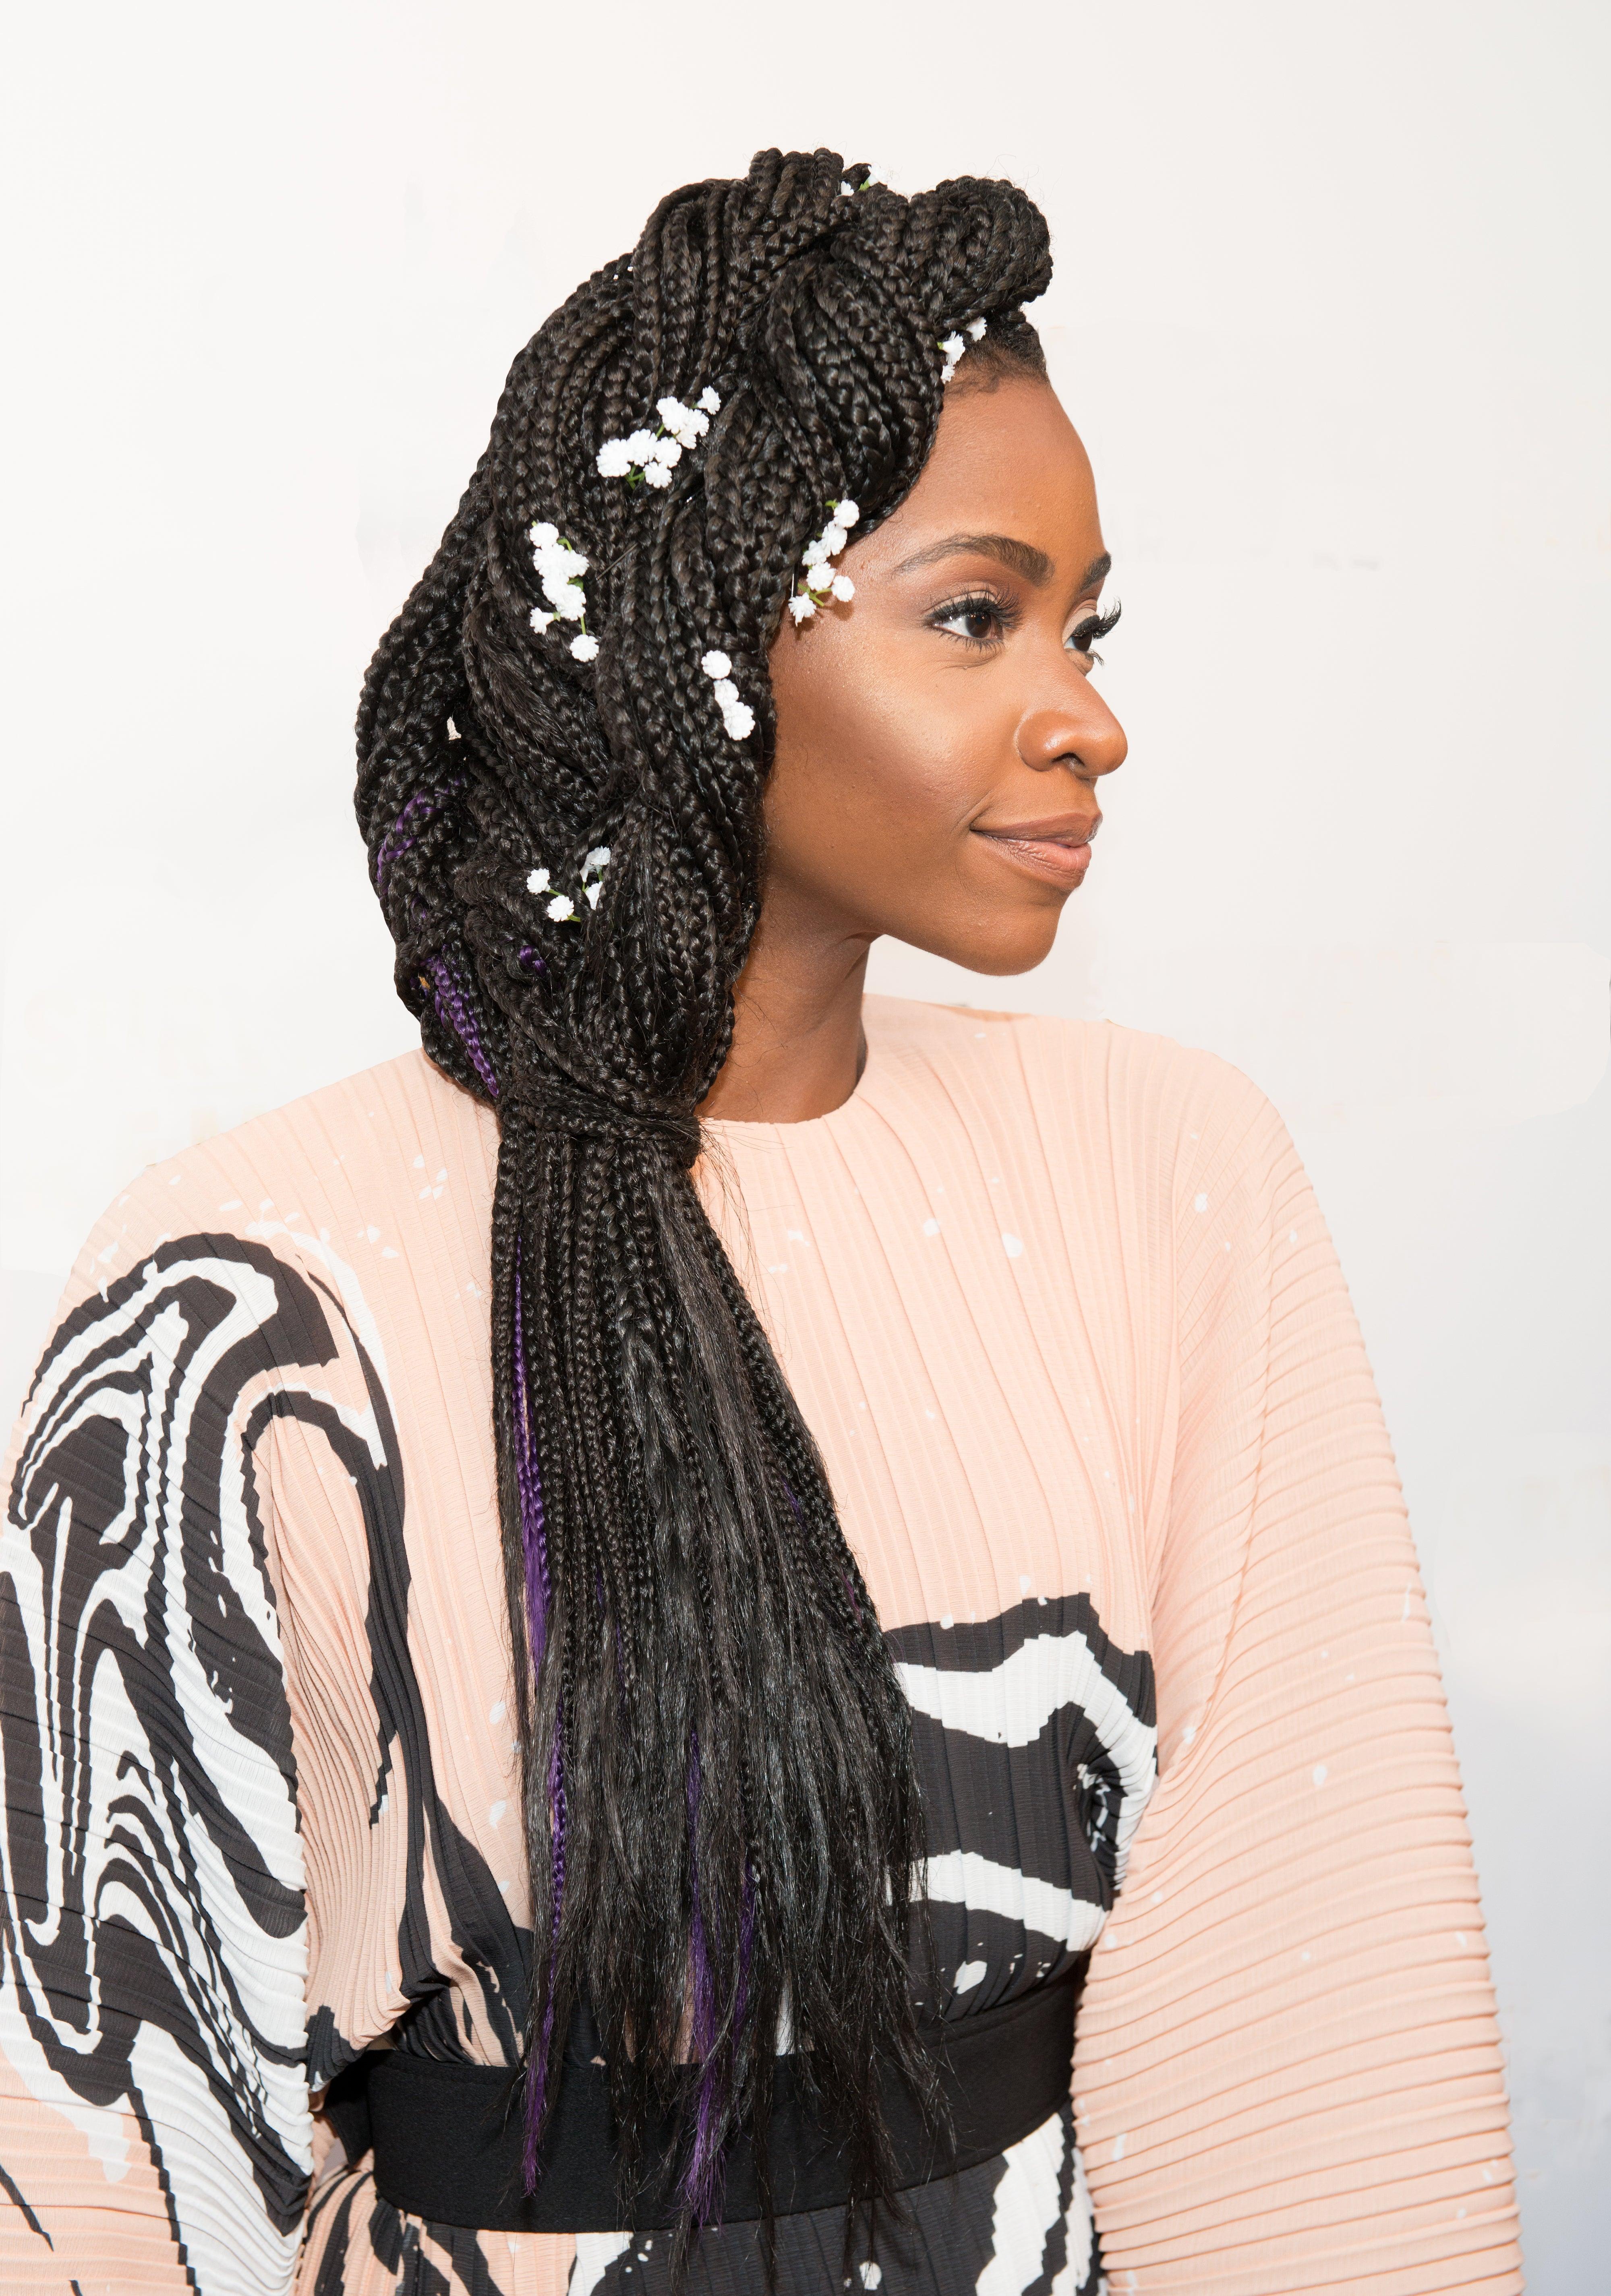 #HauteHair: Teyonah Parris' Embellished Braid is Everything!